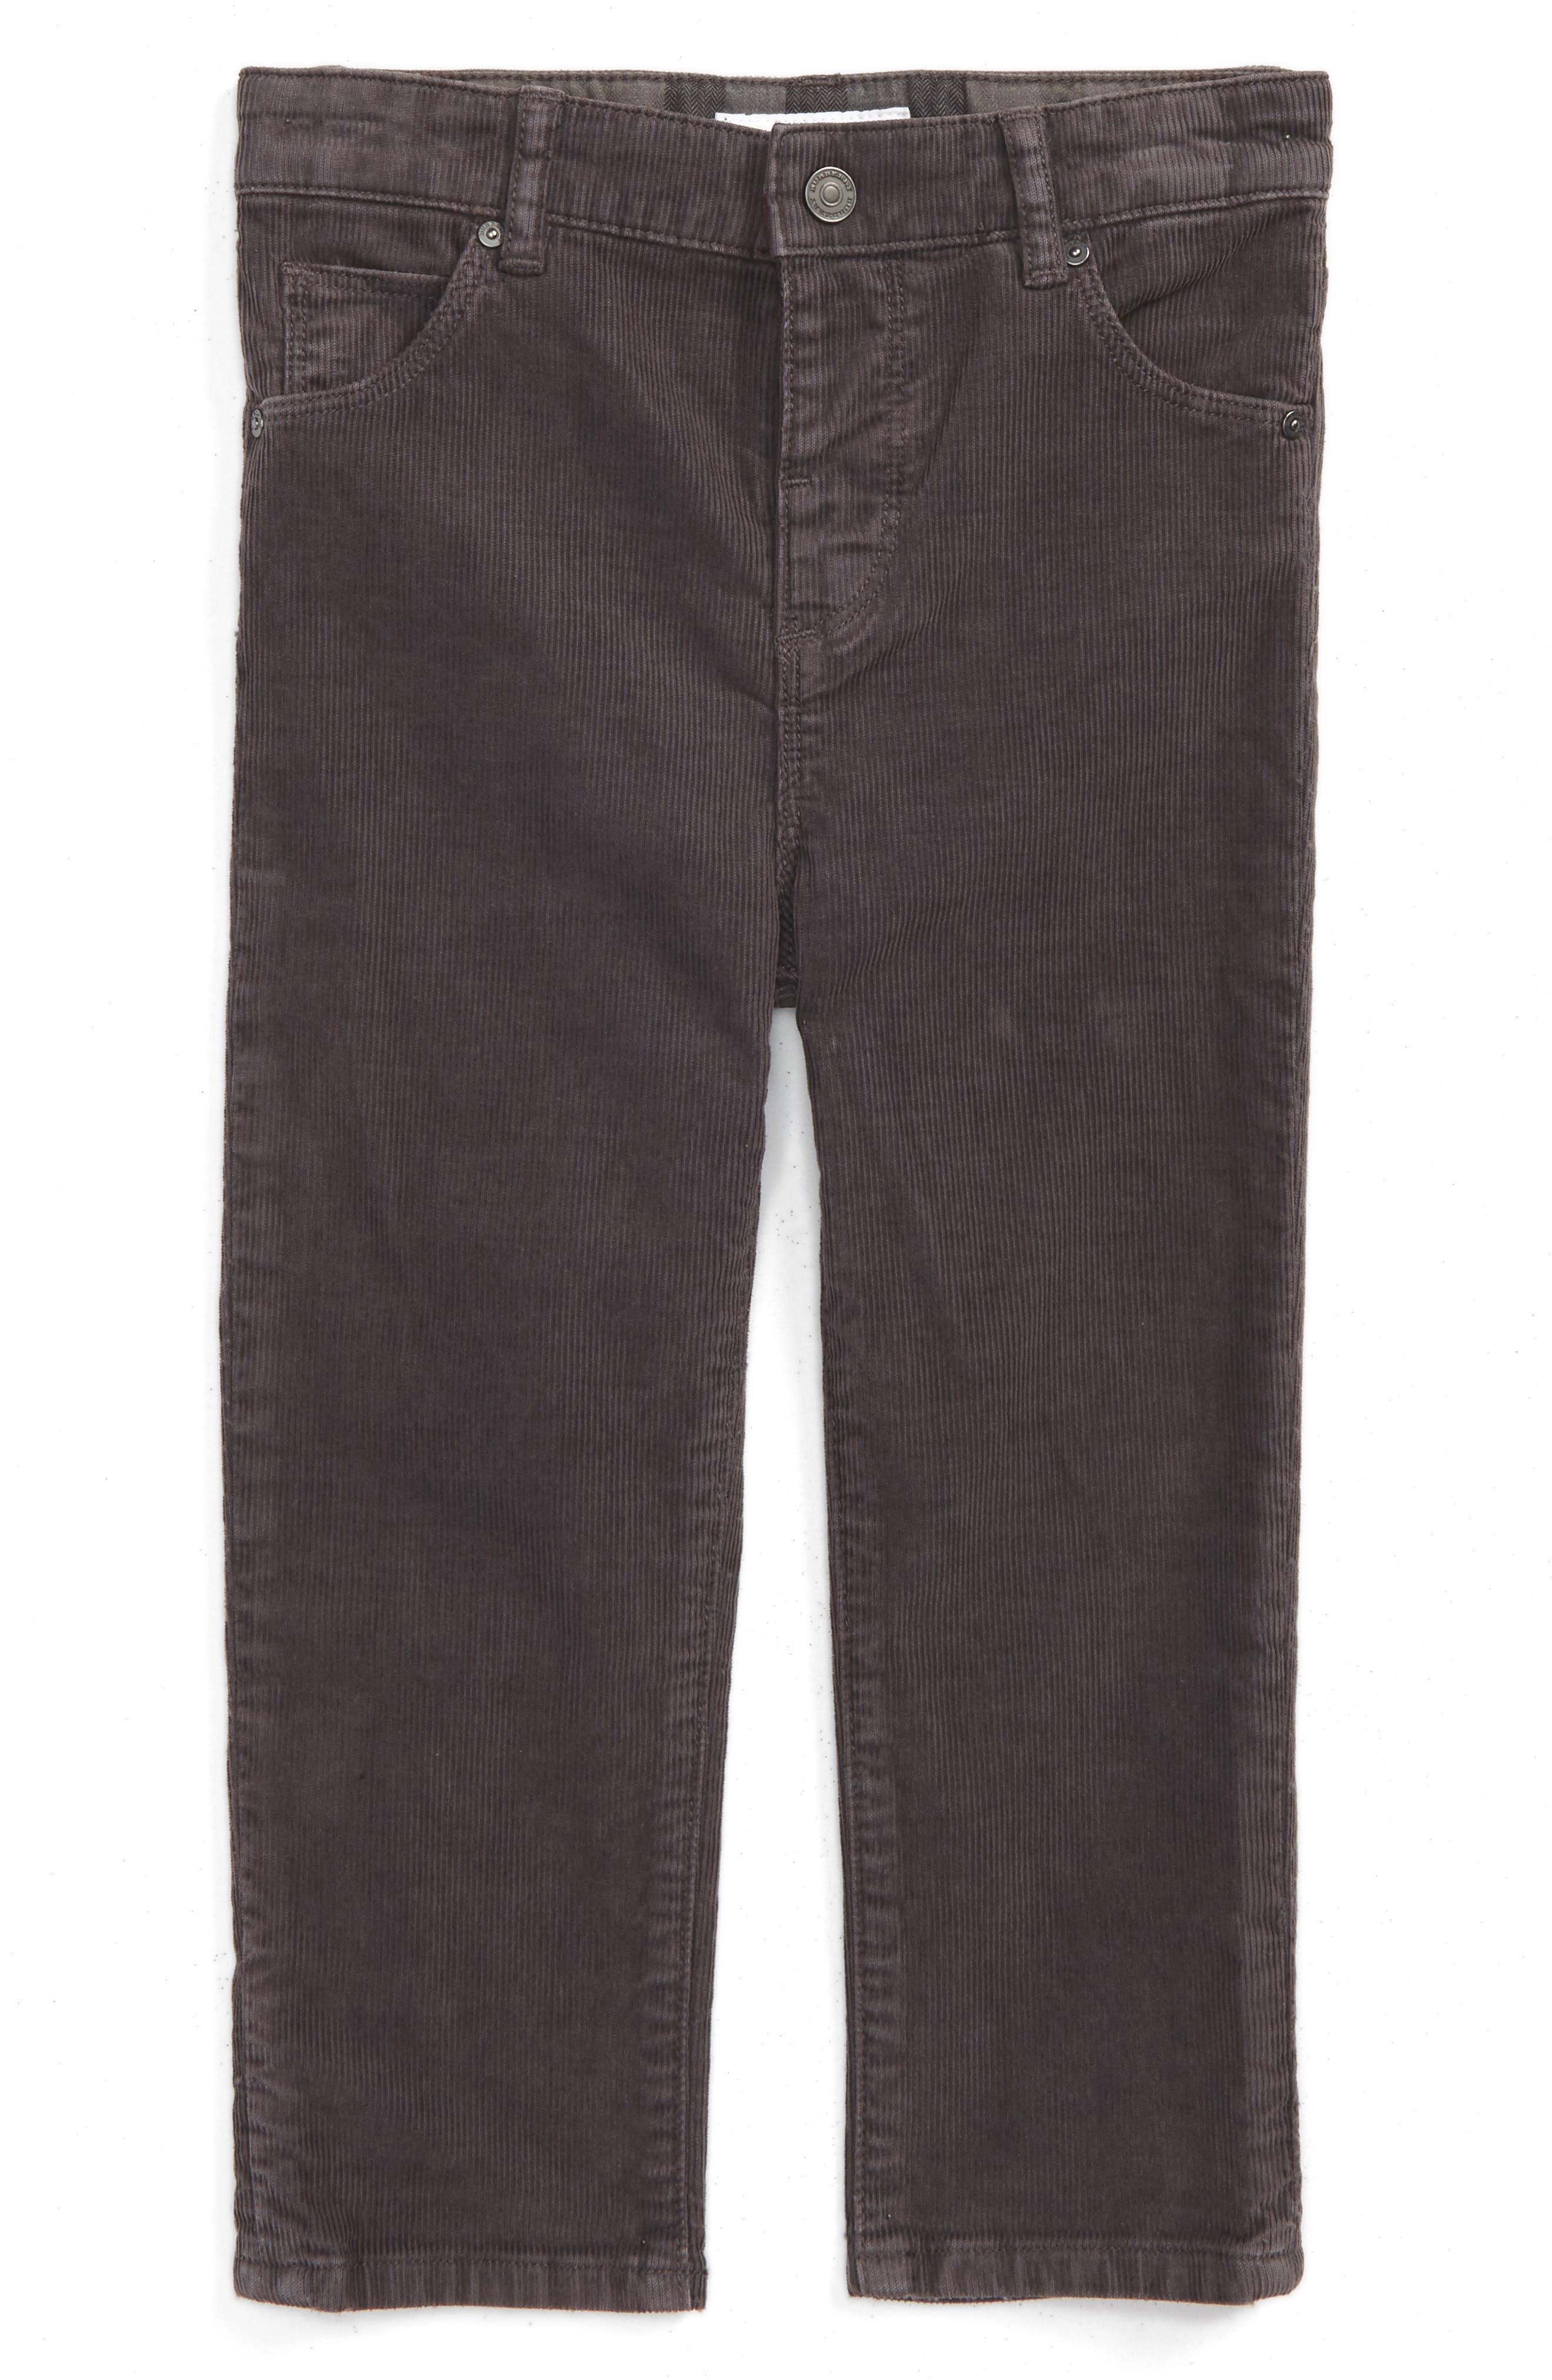 Burberry Langston Corduroy Skinny Pants (Toddler Boys)